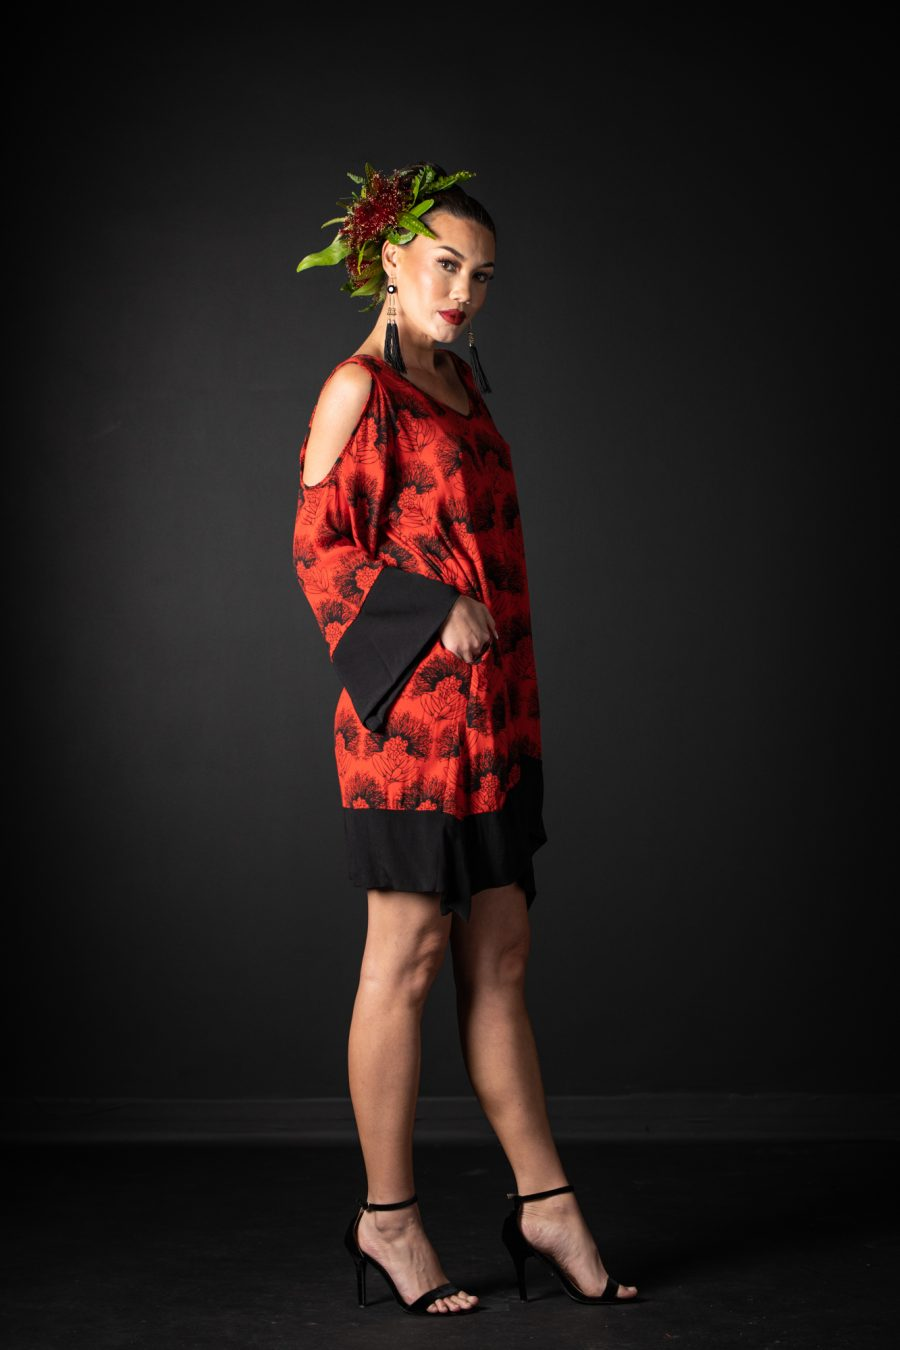 Model wearing Kamakana Top with Pocket in Firey Red-Black Kalihilehua Pattern - Side View